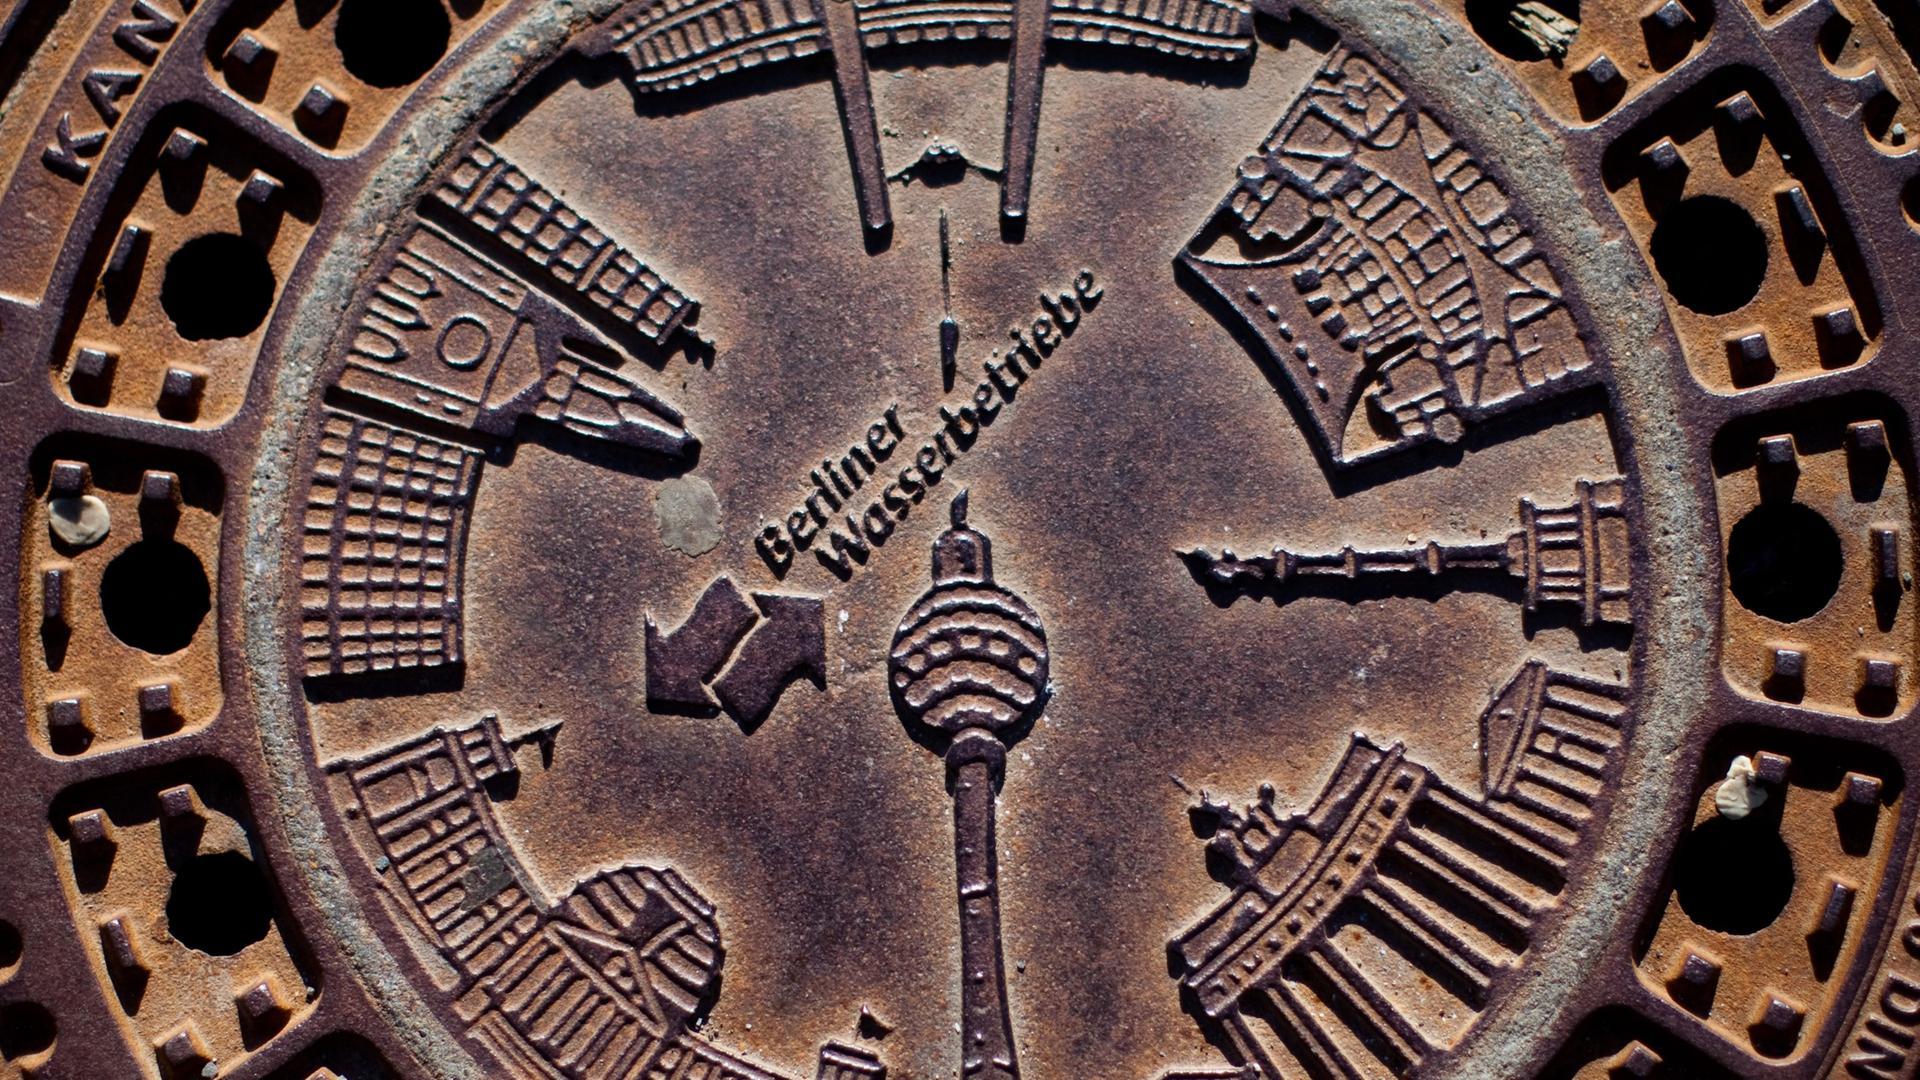 Berlin Berlin Skandale Lügen Schimpf Und Schande Zdfmediathek